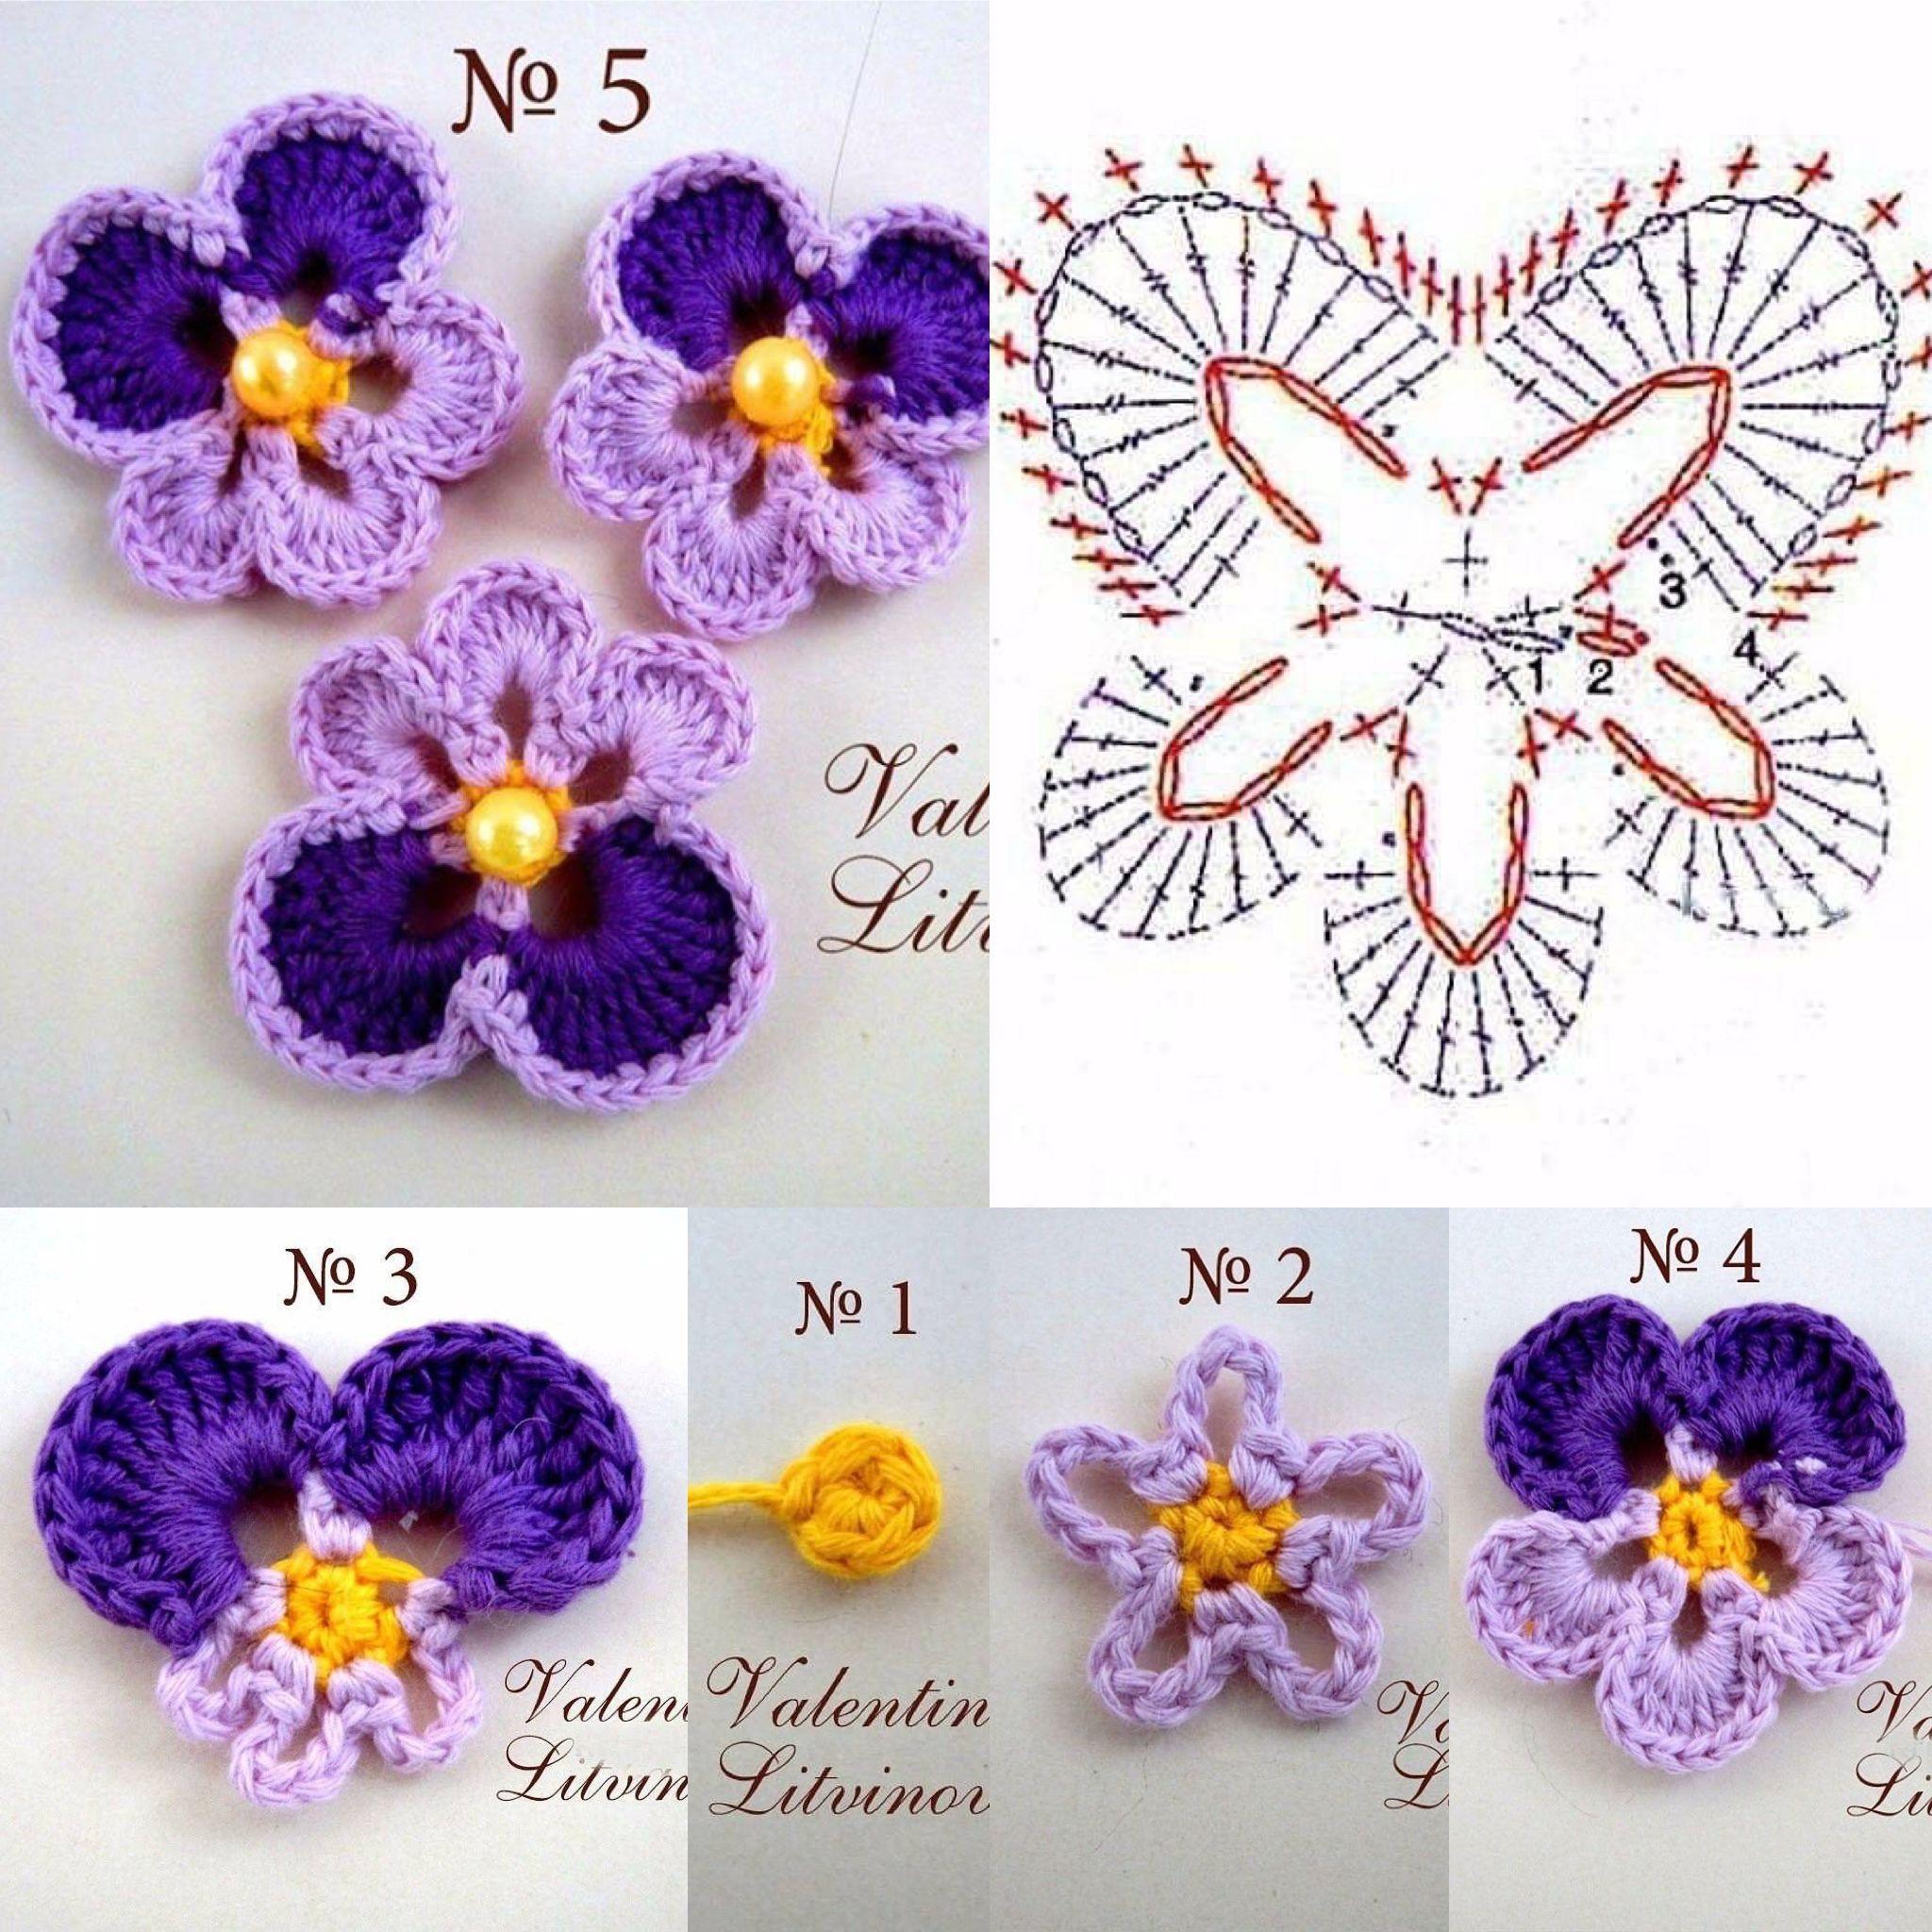 Анютины глазки | Chats en crochet | Pinterest | Flores, Ganchillo y Flor